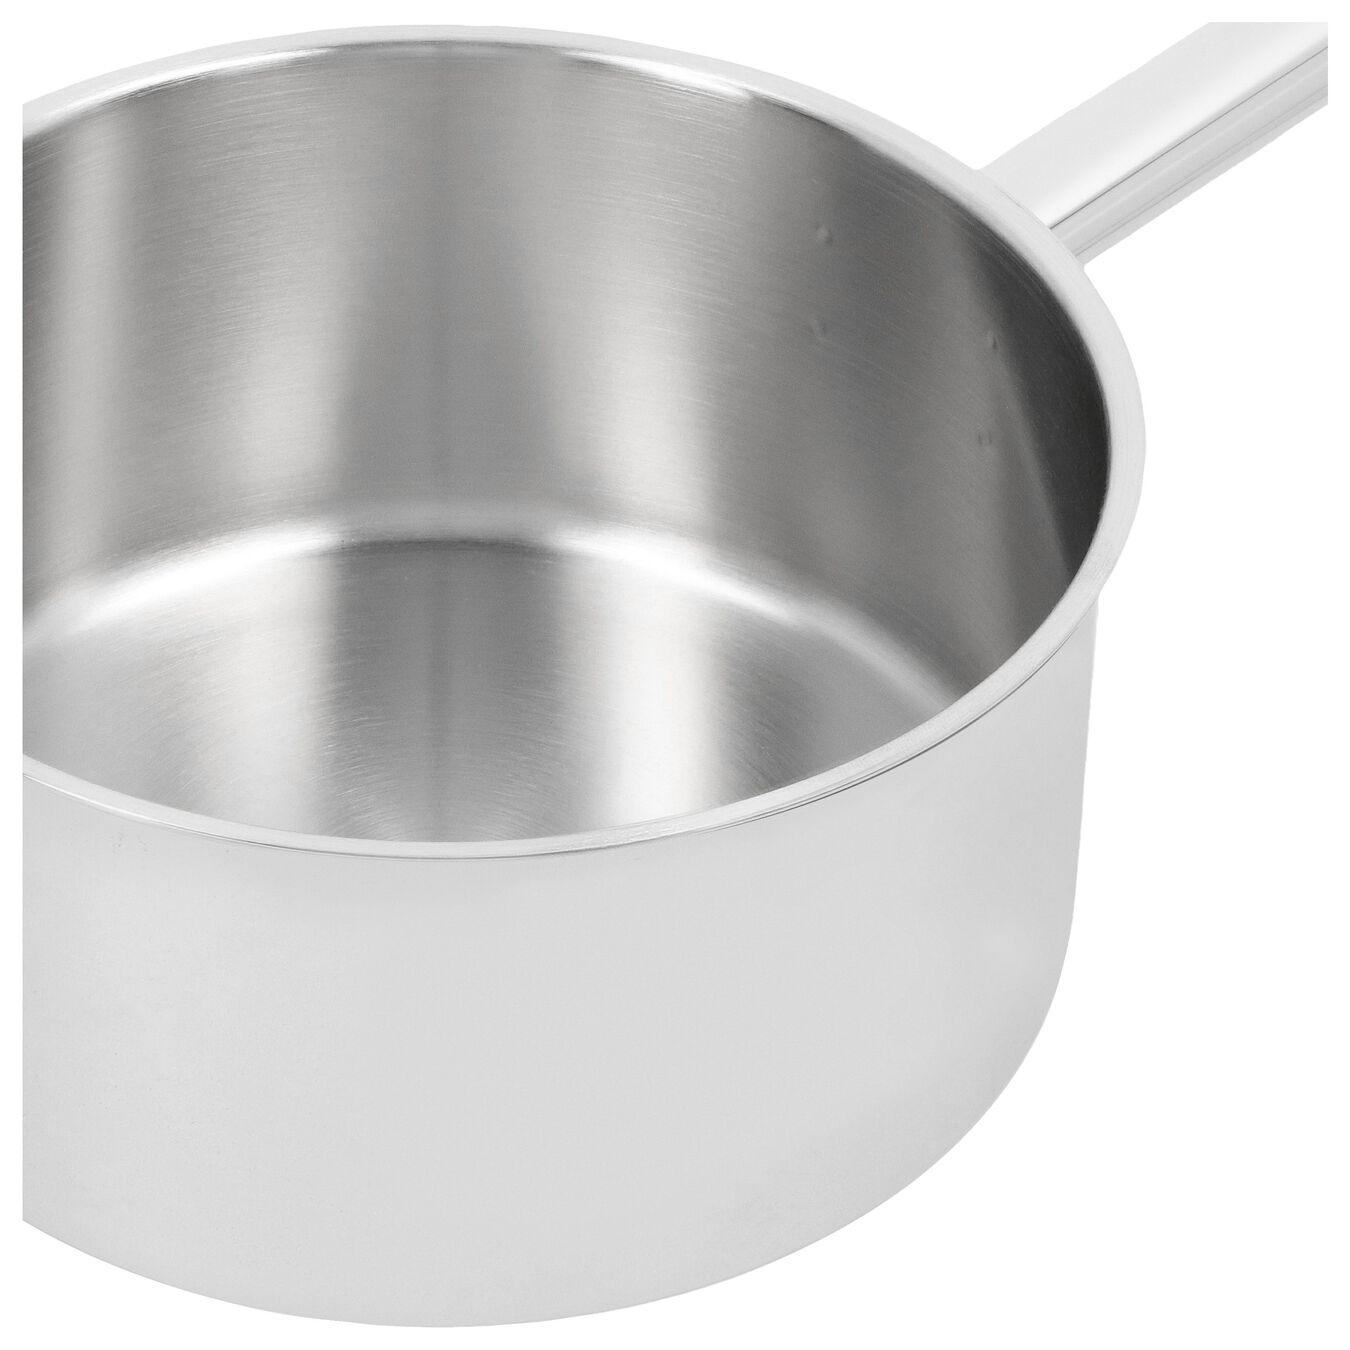 Steelpan zonder deksel 20 cm / 3 l,,large 2